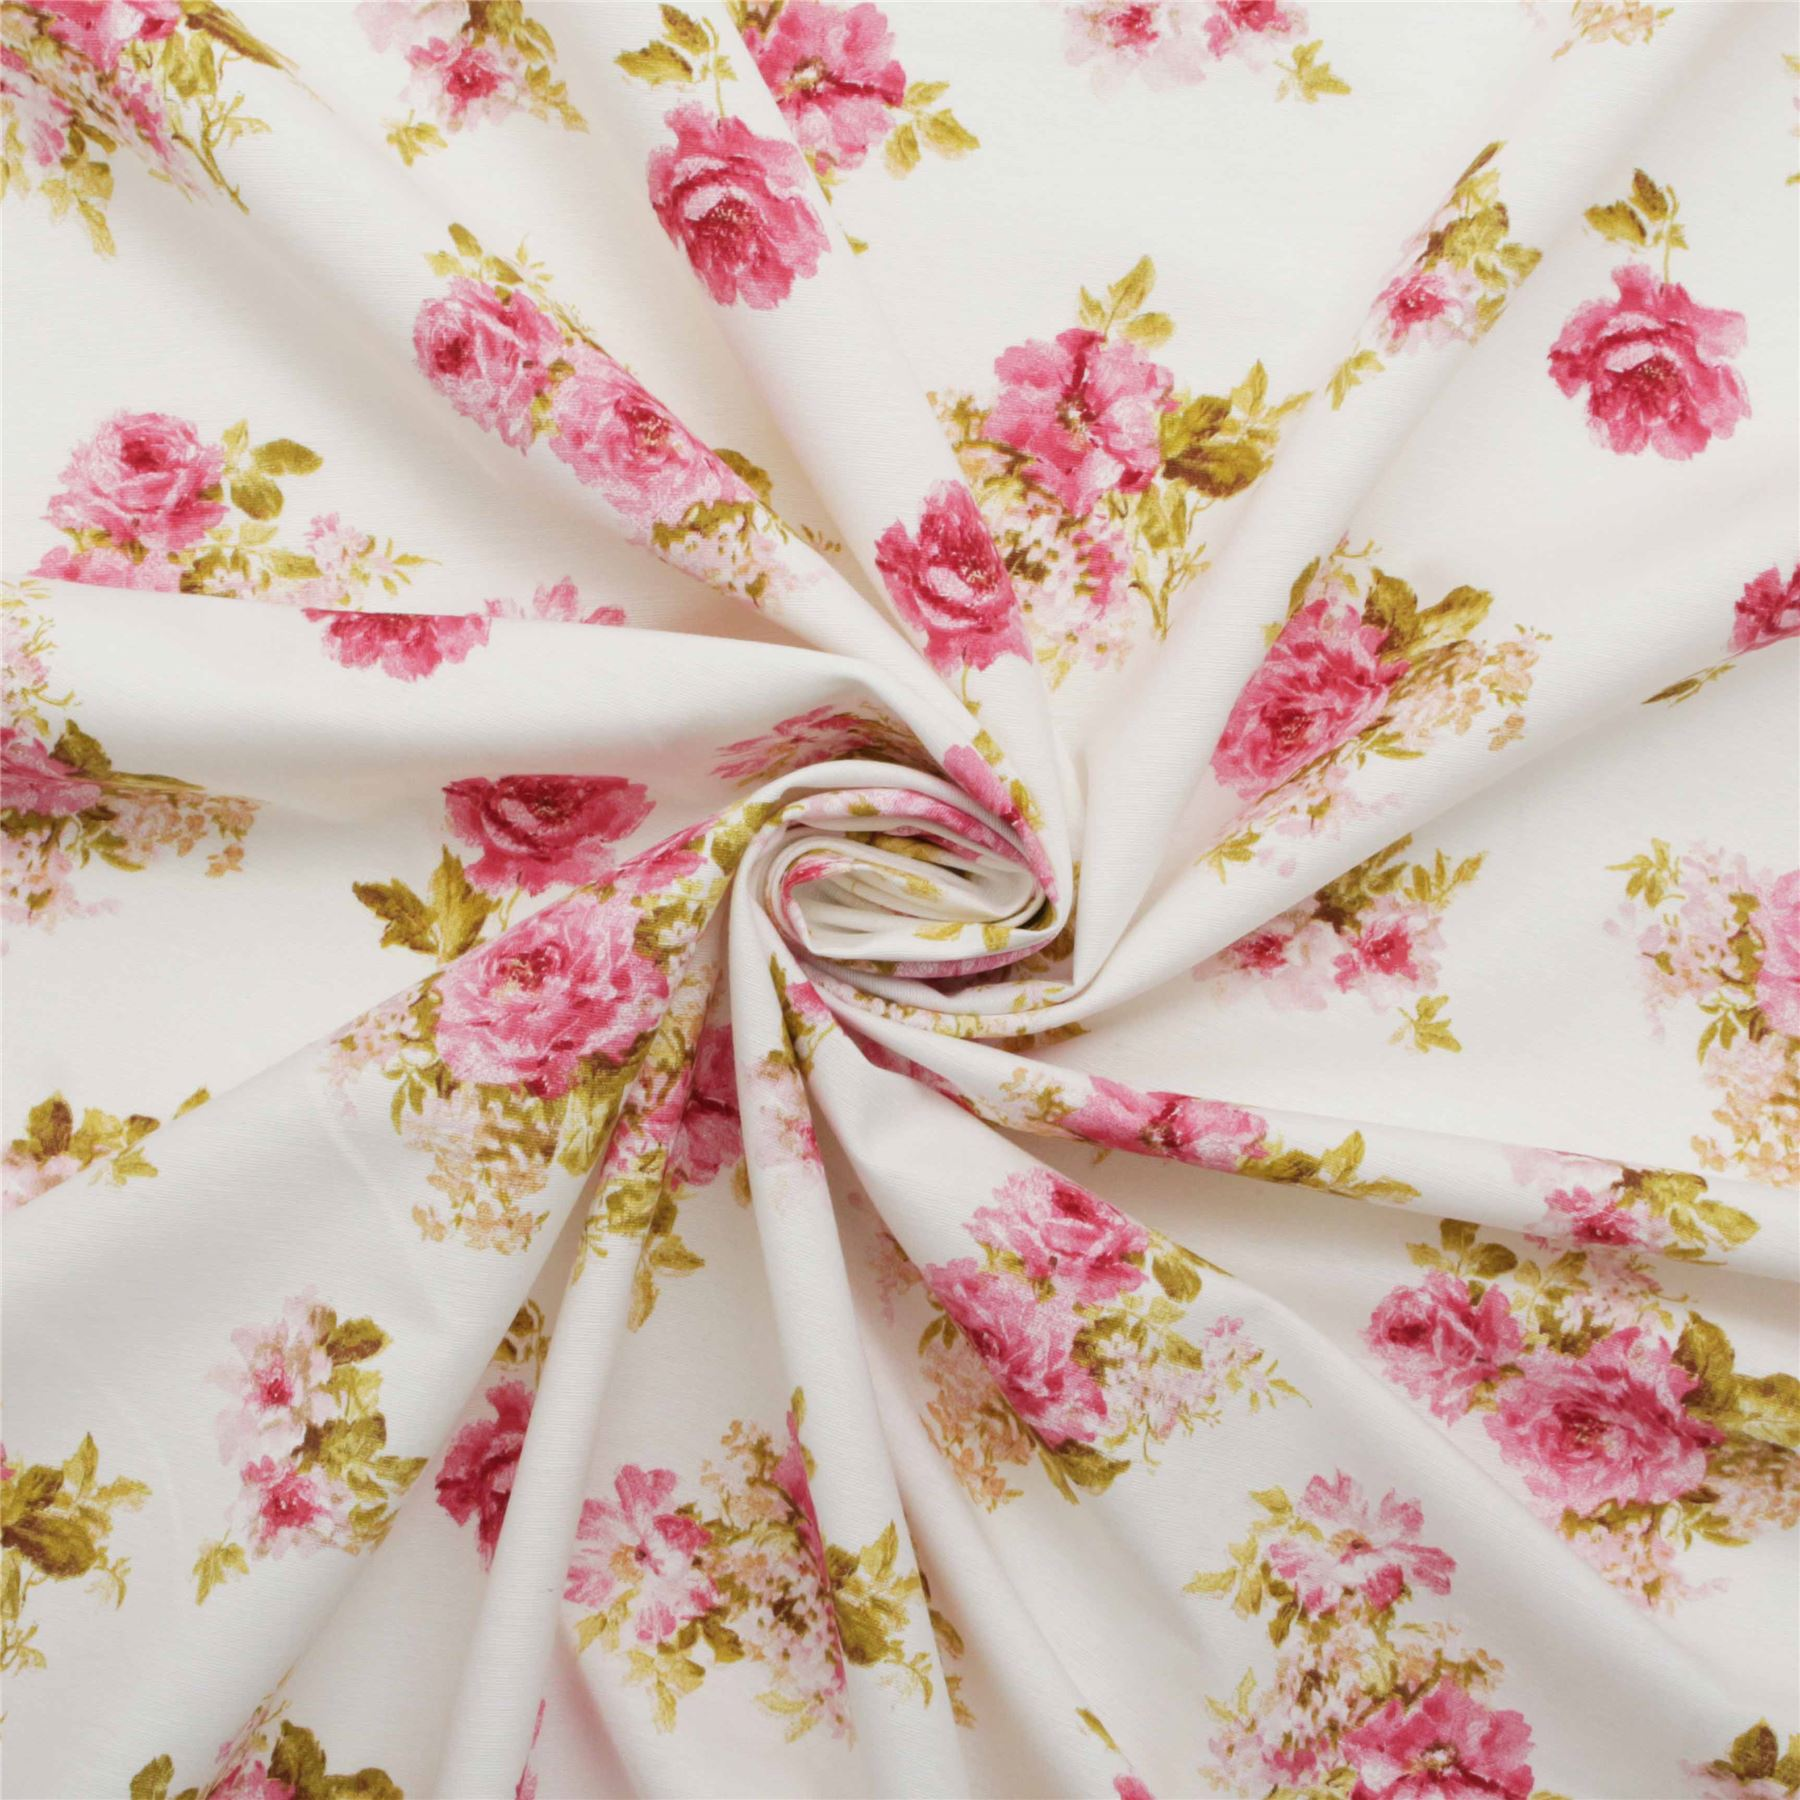 Kitchen Curtains Fabric Vintage Kitchen Fabric Chintz: Vintage Chintz Shabby Roses Print Retro 100% Cotton Curtain Upholstery Fabric